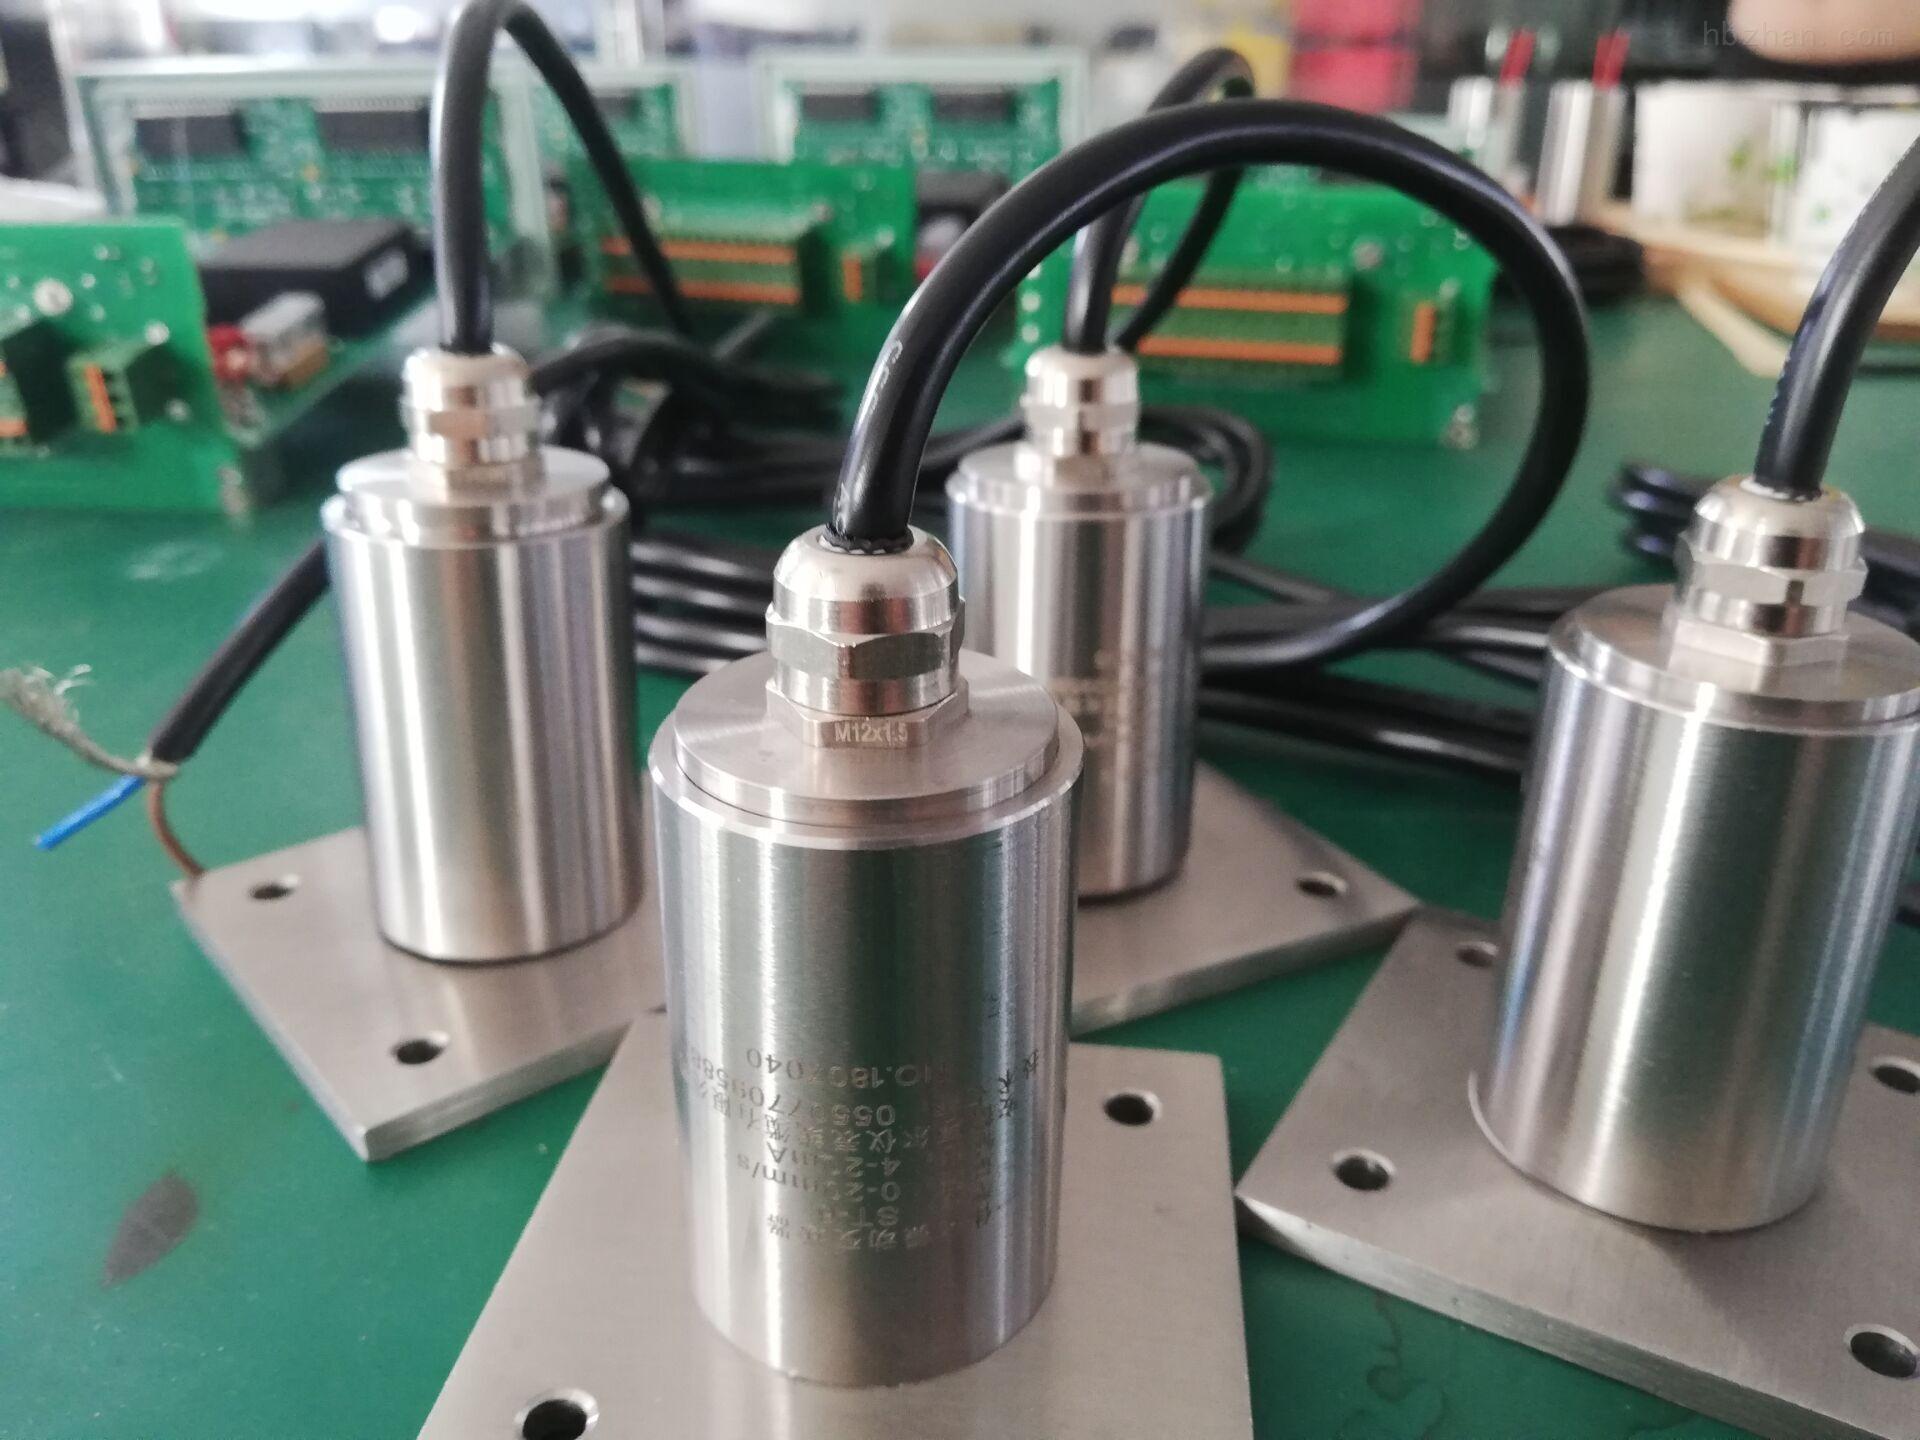 XT-1磁电式振动速度传感器:瓦振探头